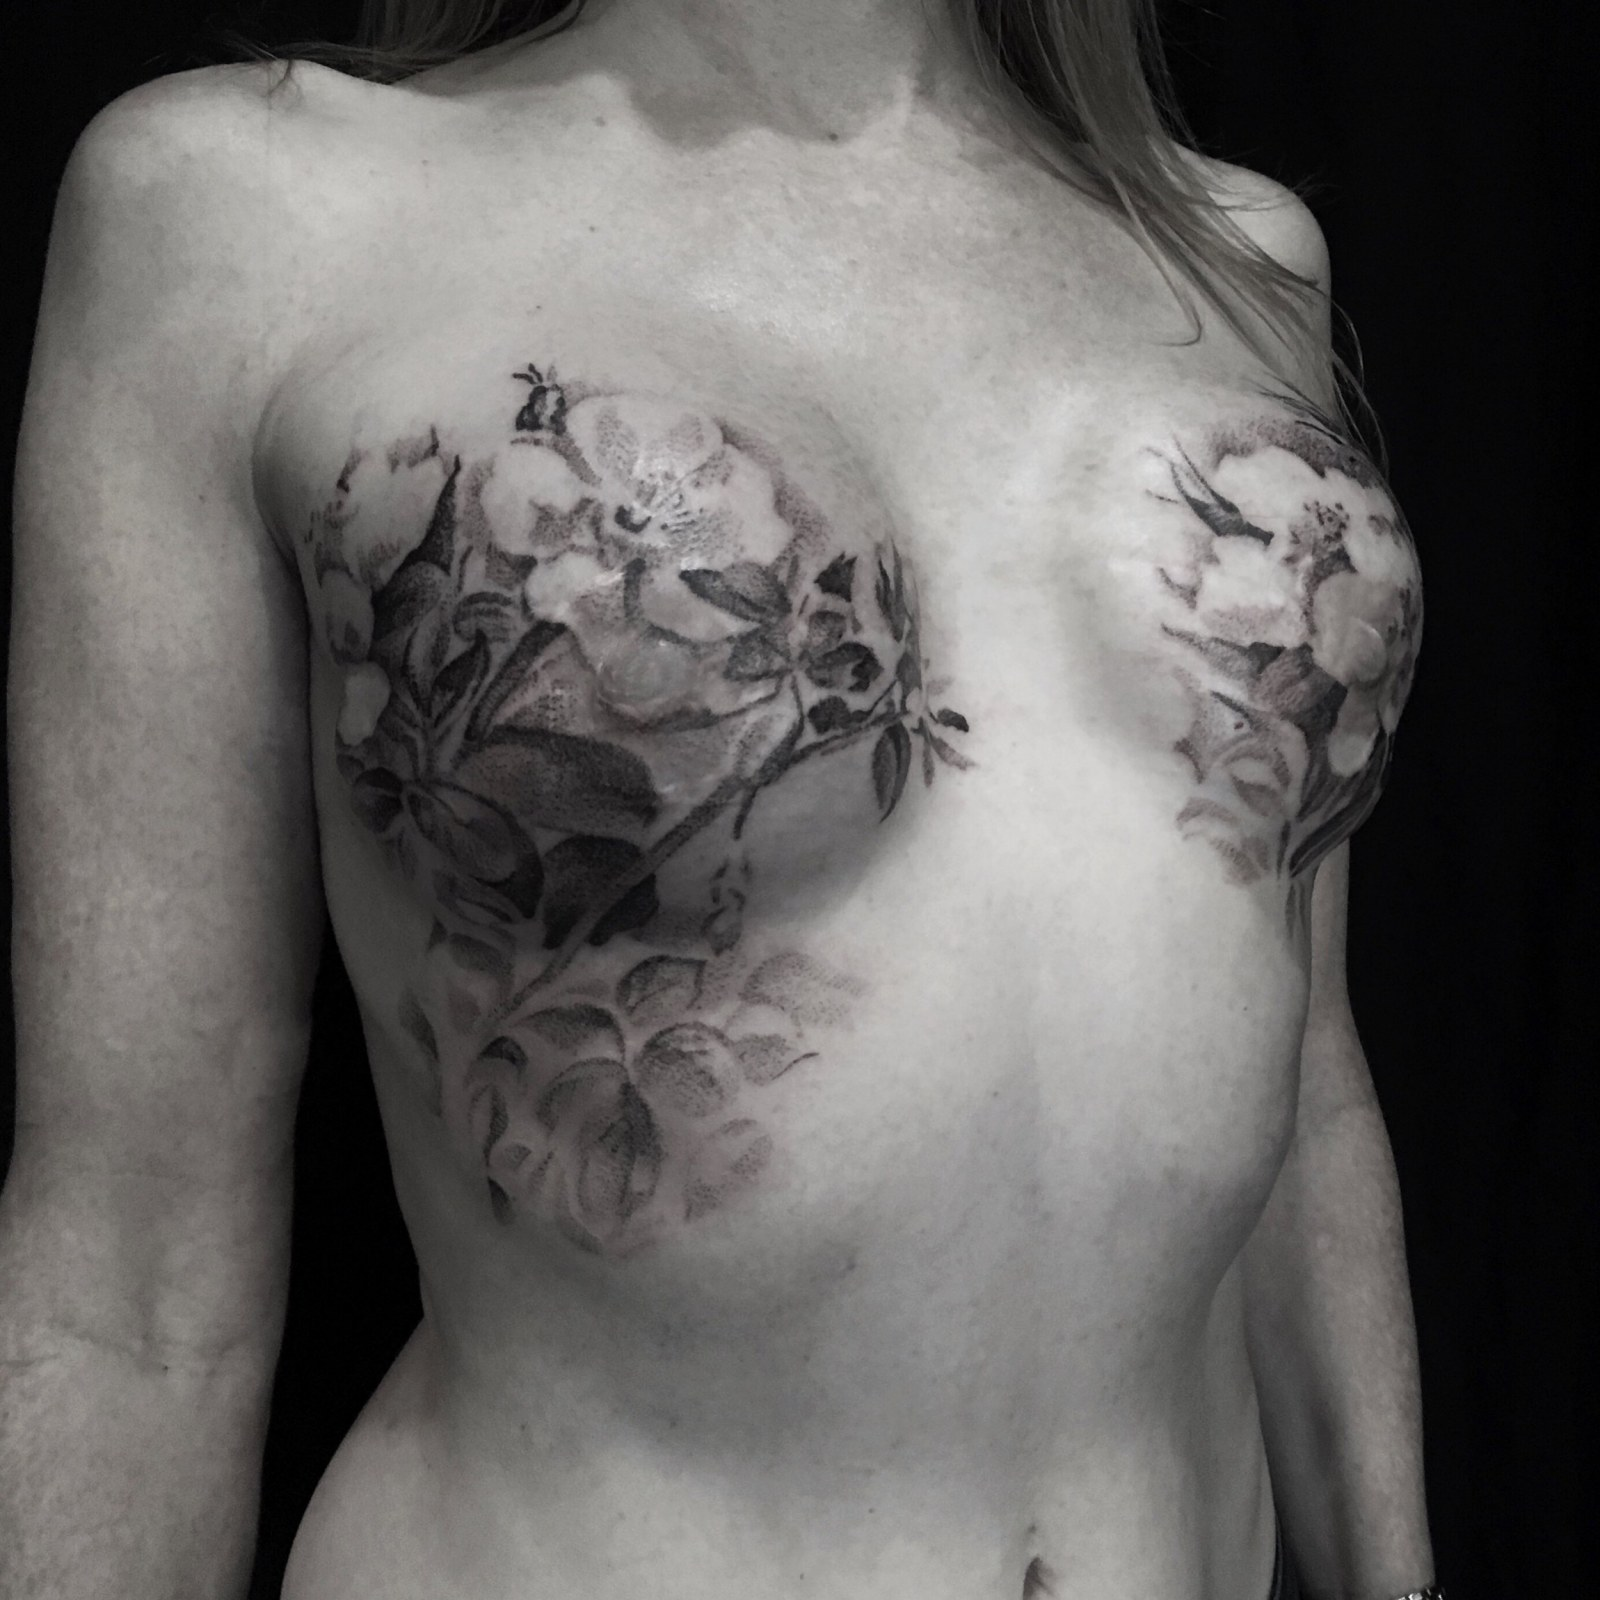 e68964878 Tattooists Help Breast Cancer Survivors Transform Scars Into Art